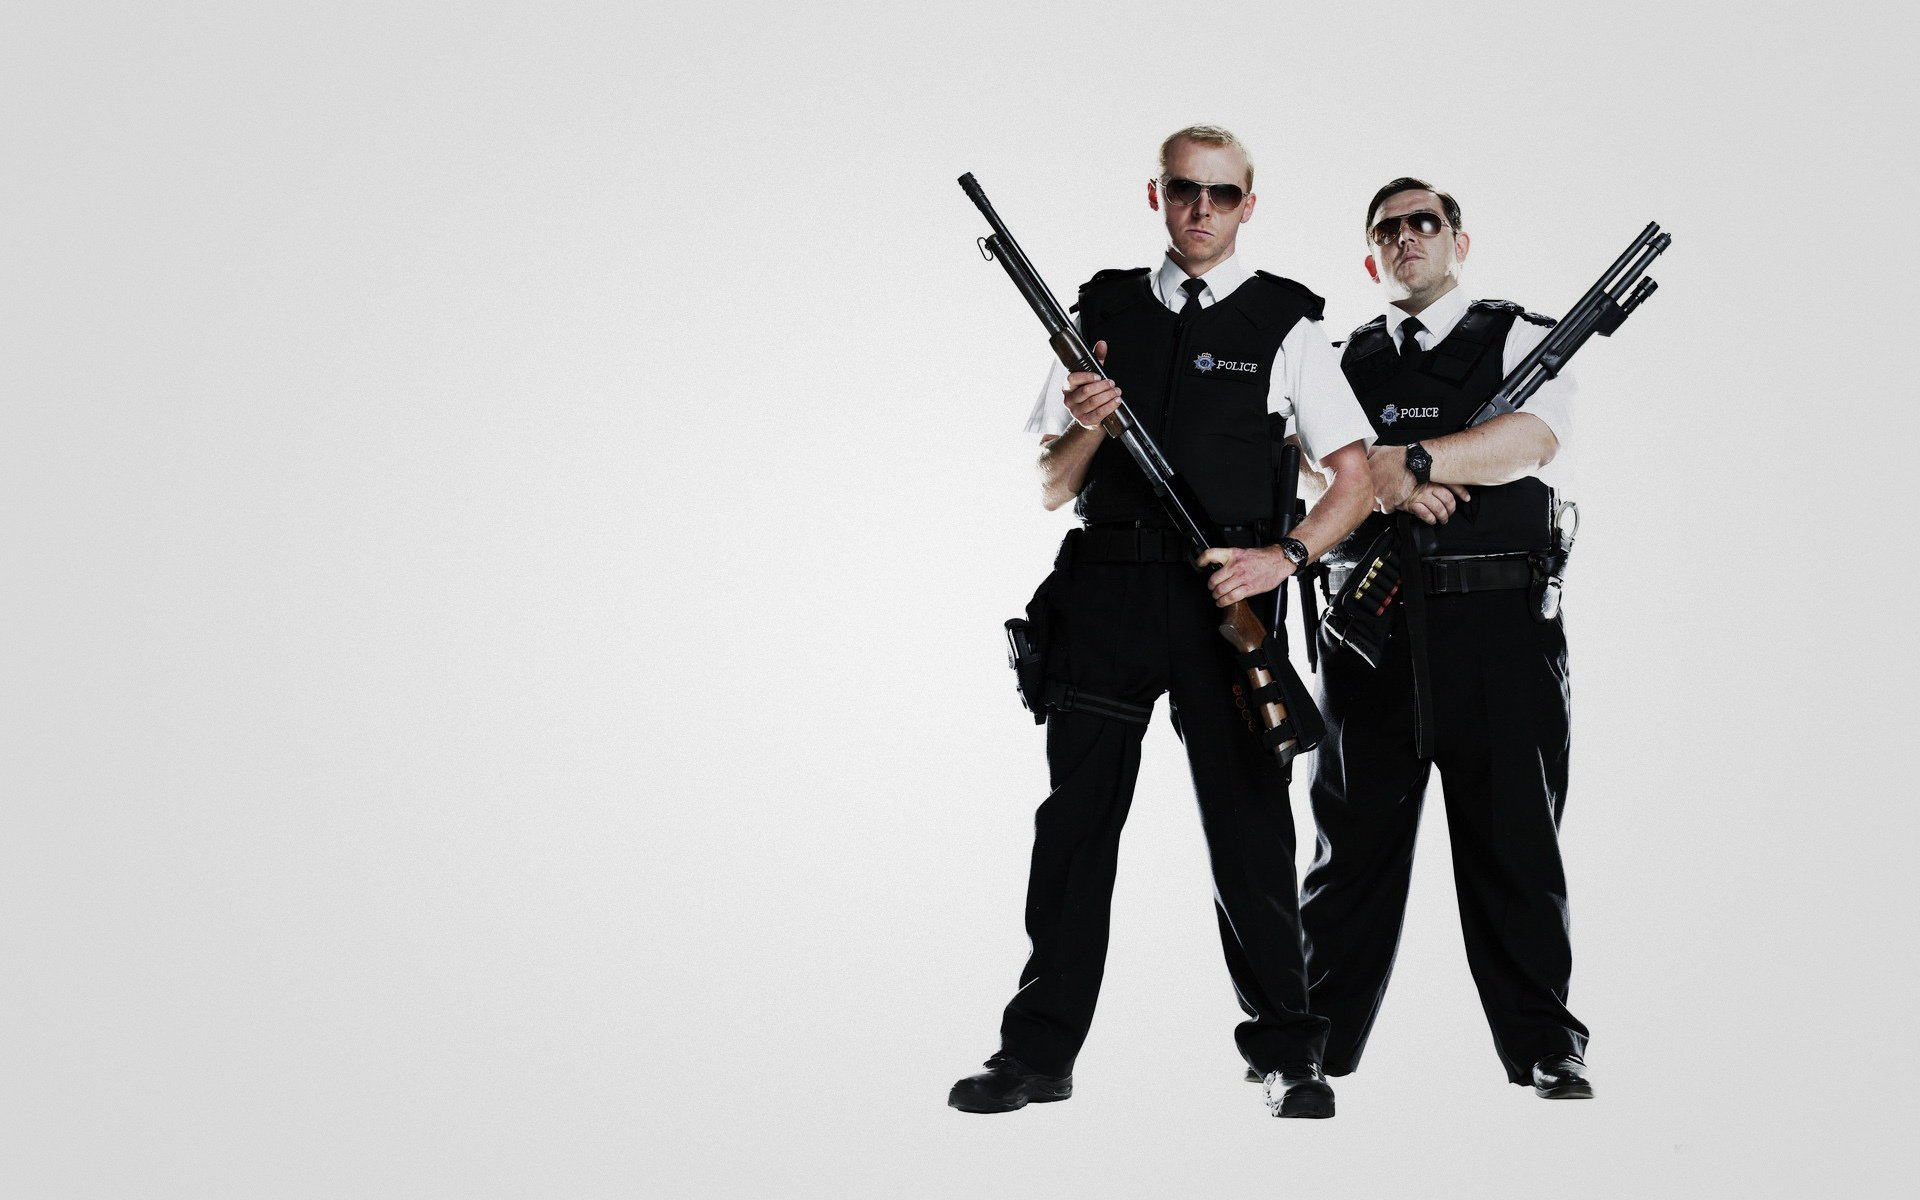 Police пистолет загрузить